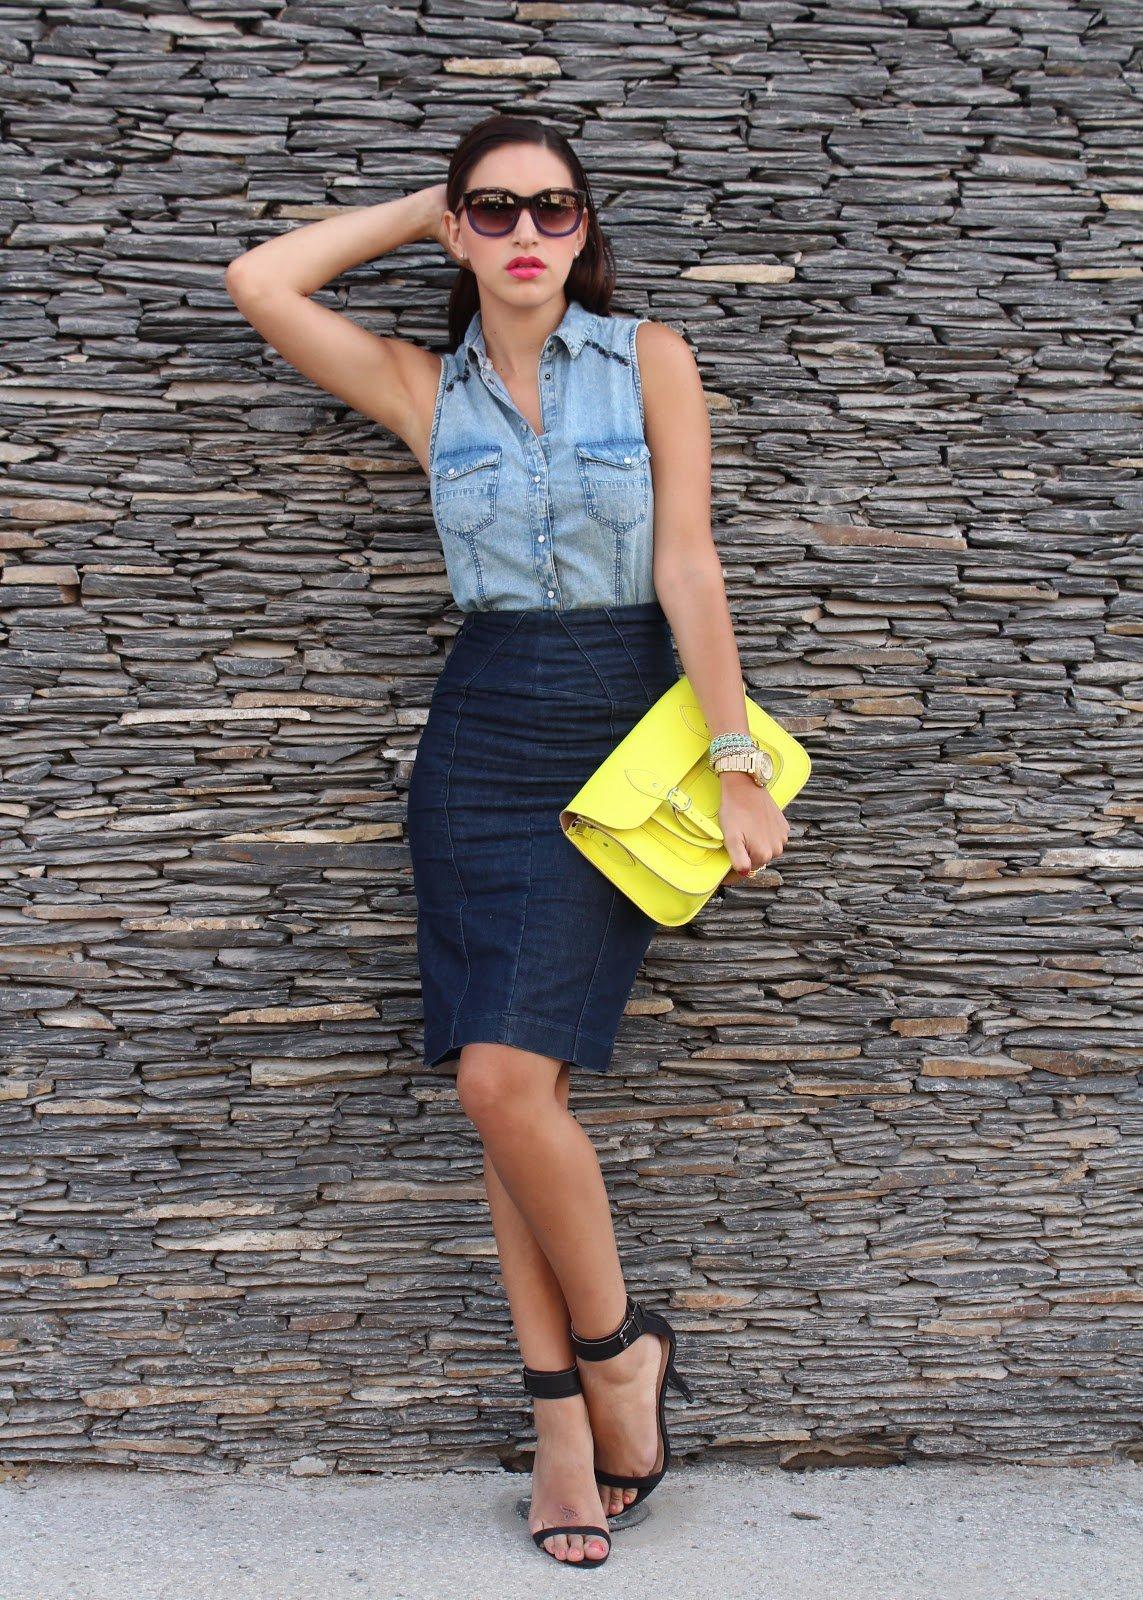 e92fe3b796 10 Innovative And Stylish Ways To Wear A Pencil Skirt